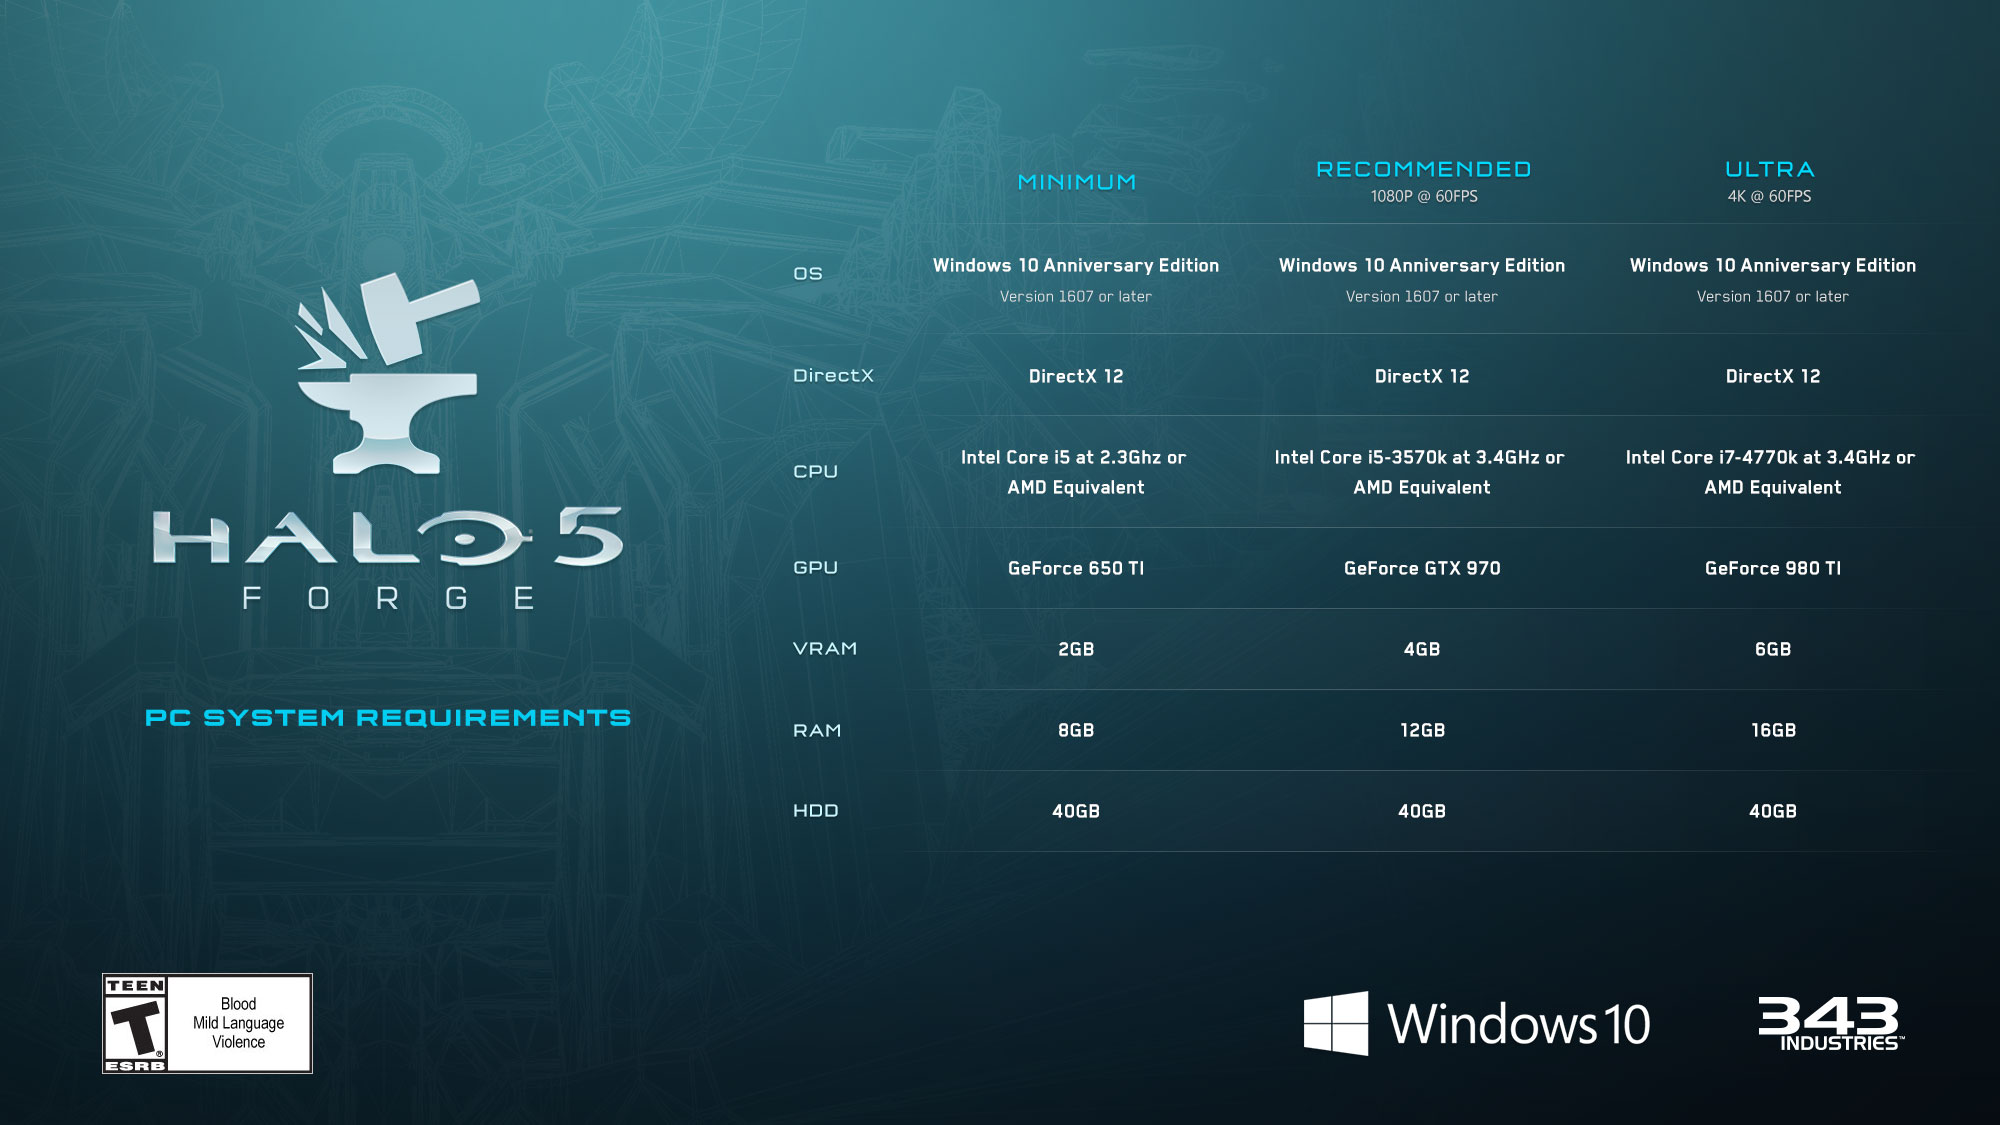 Halo 5 Forge PC Specs Note Windows 10 Anniversary Edition